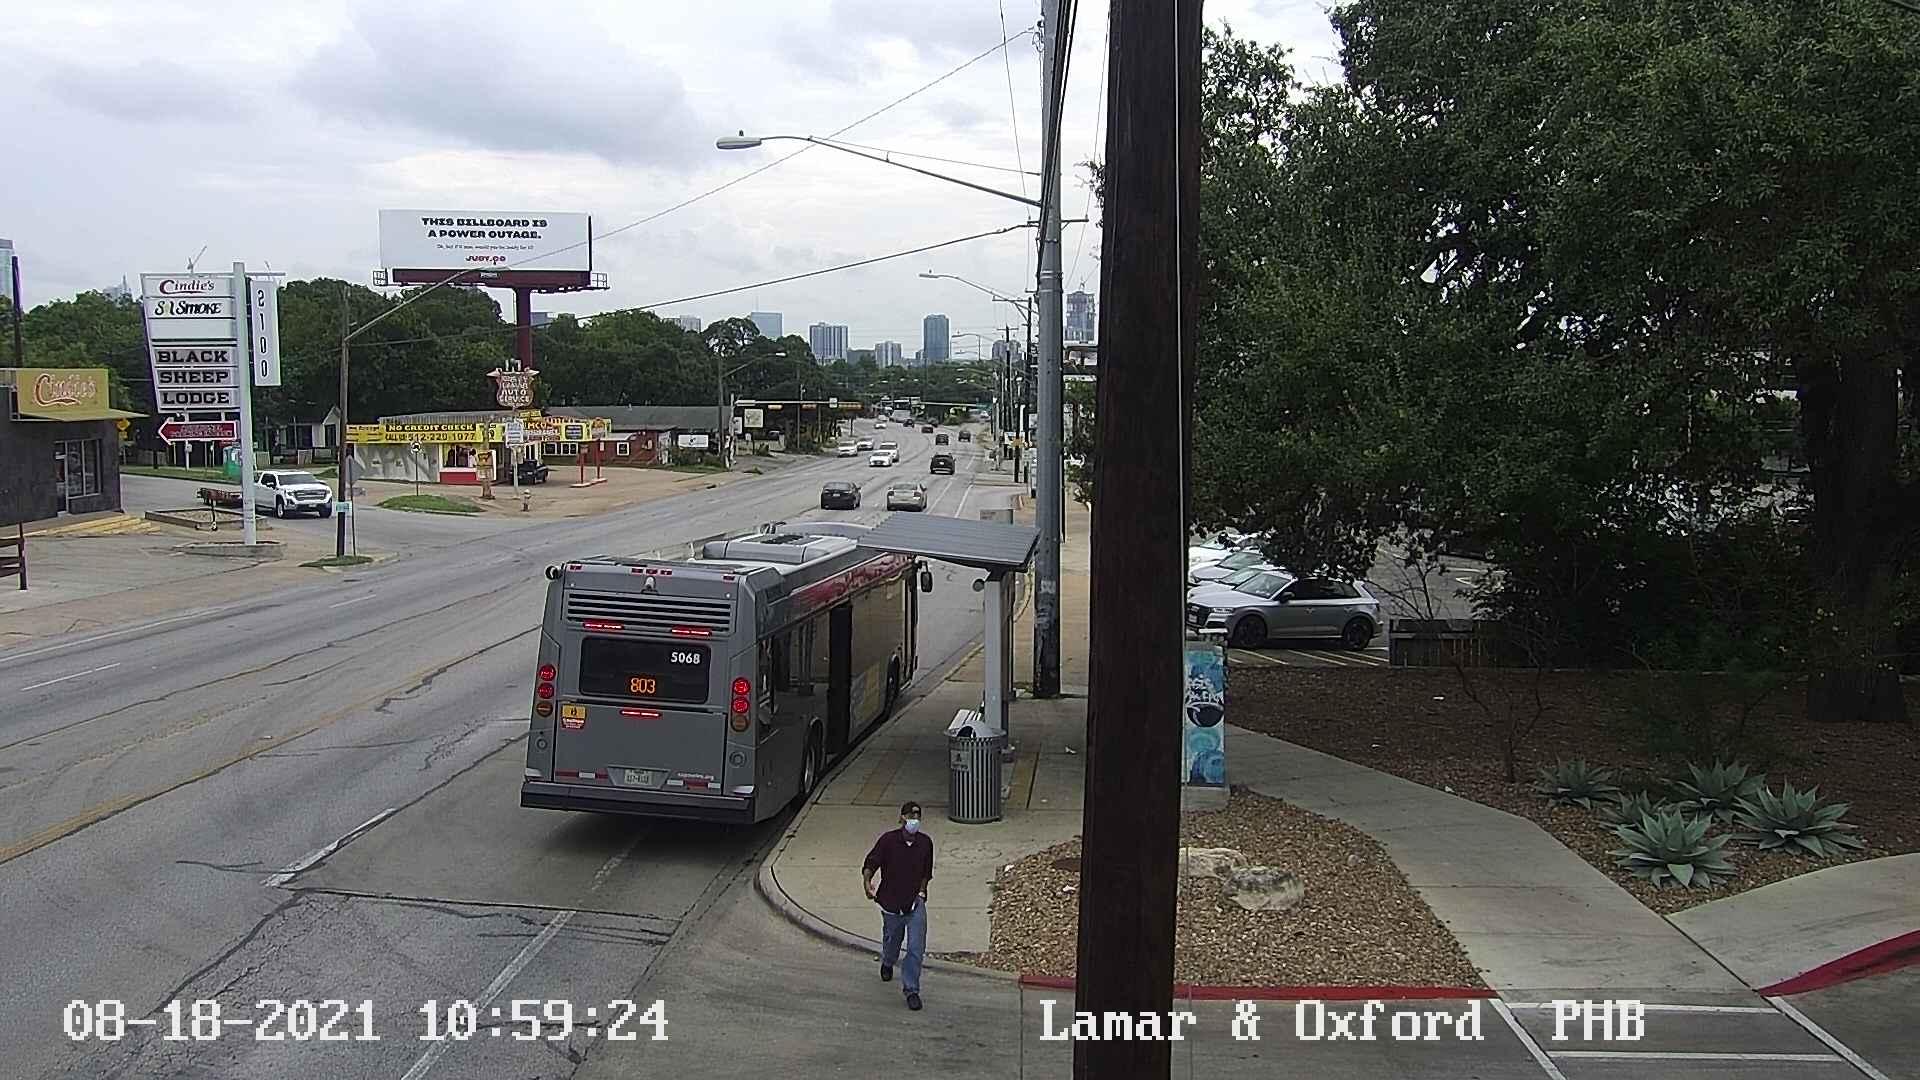 2100 BLK S LAMAR BLVD (Oxford Ave)